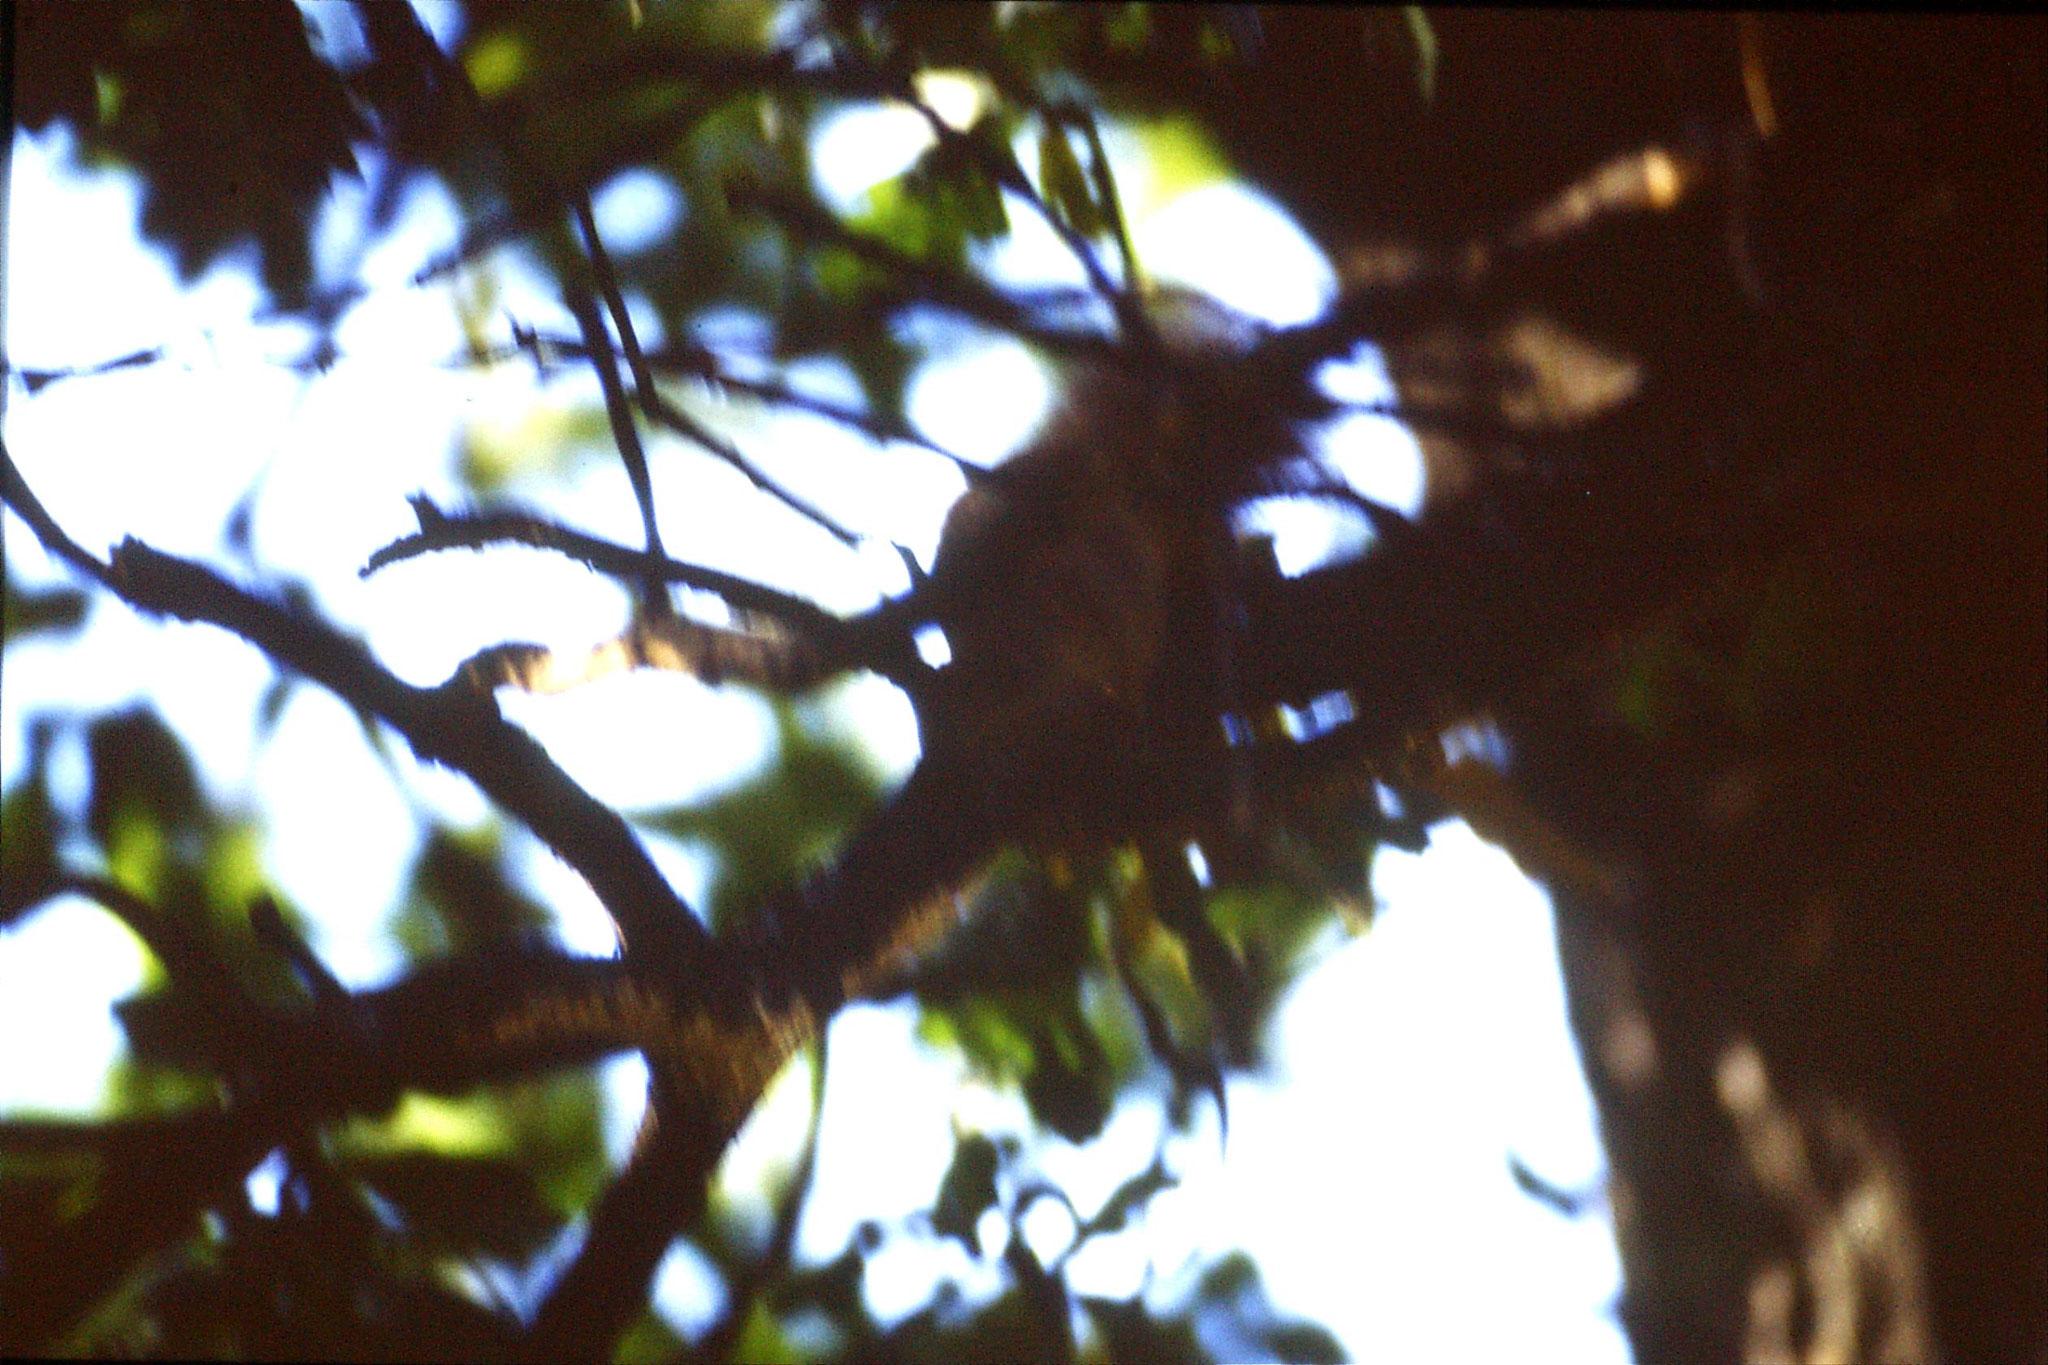 16/9/1988: 11: Oslo Folk Museum red squirrels